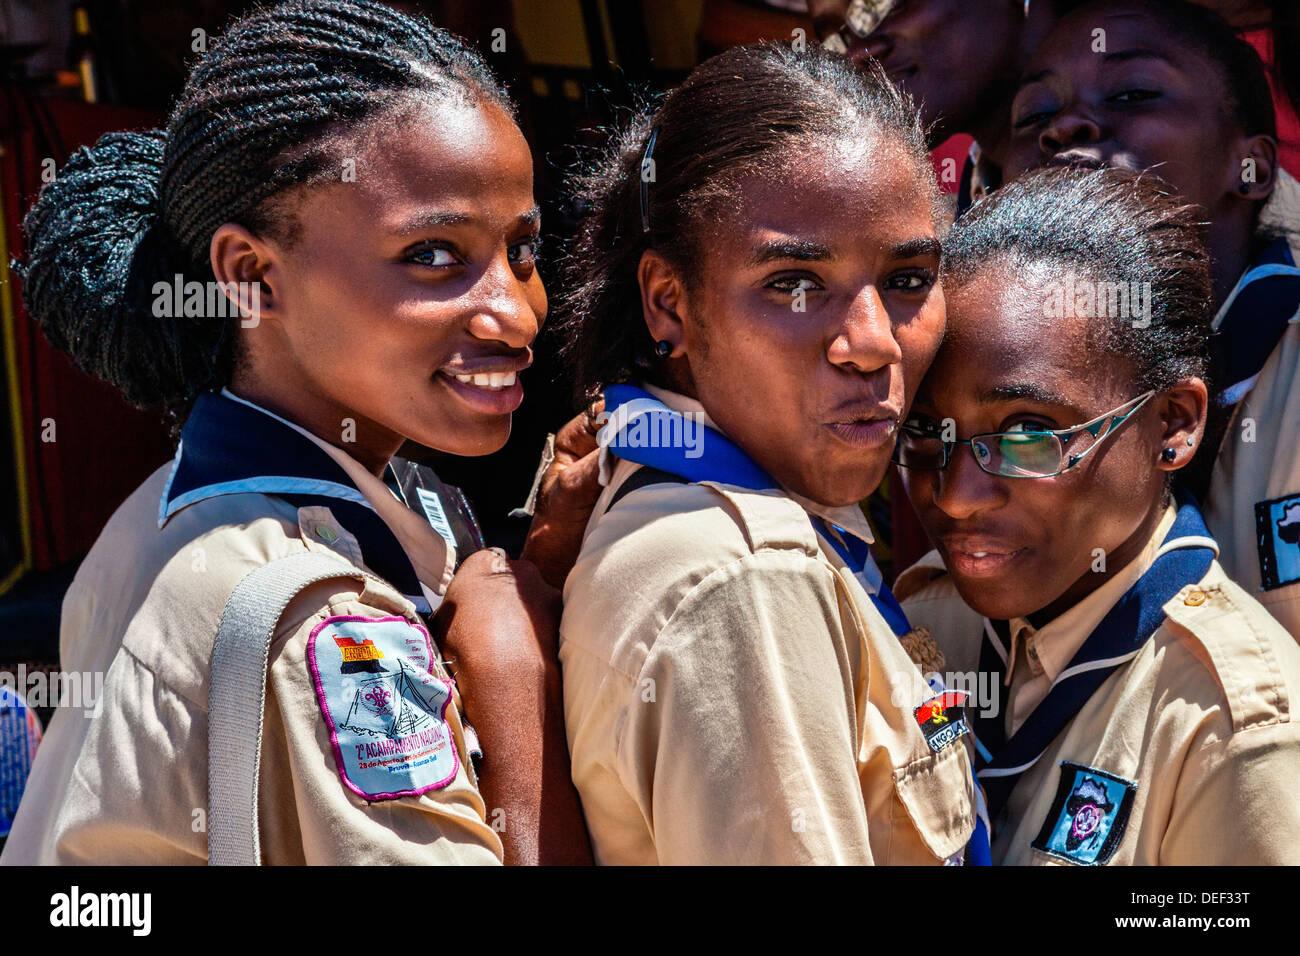 Africa, Angola, Lobito. Female scouts in Lobito. - Stock Image